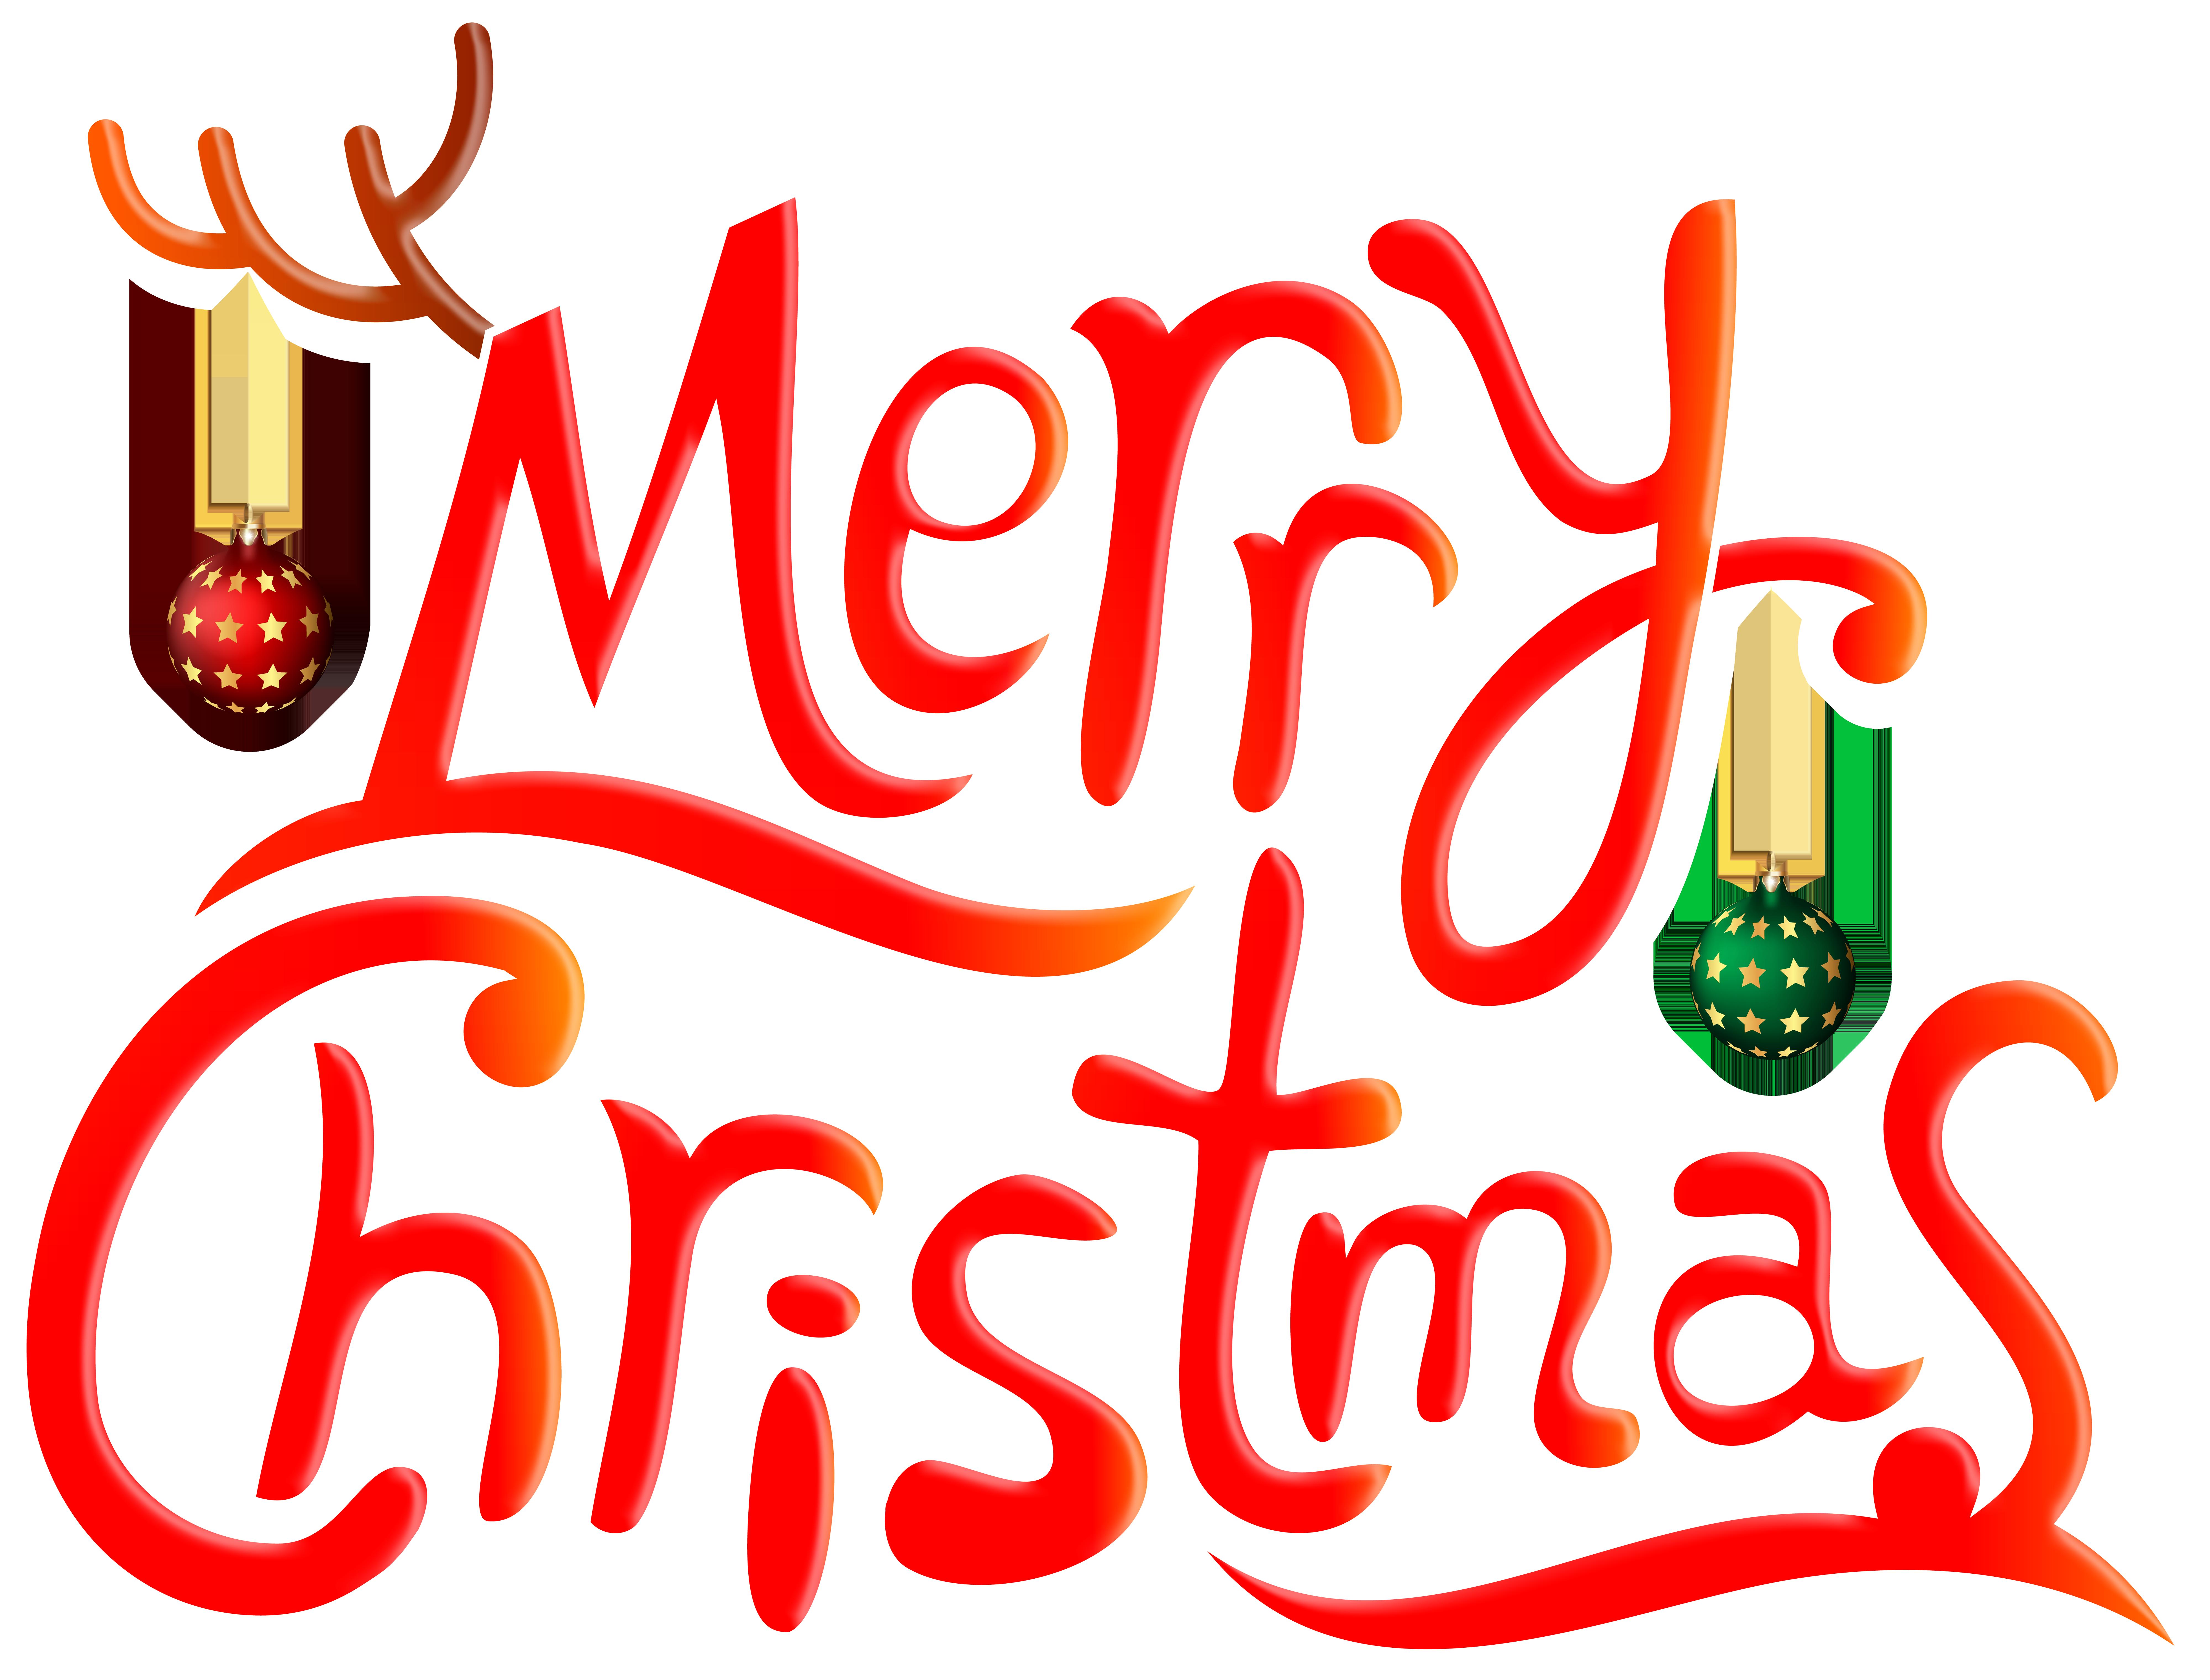 Merry Chrismas Funny PNG Clip Art Image.